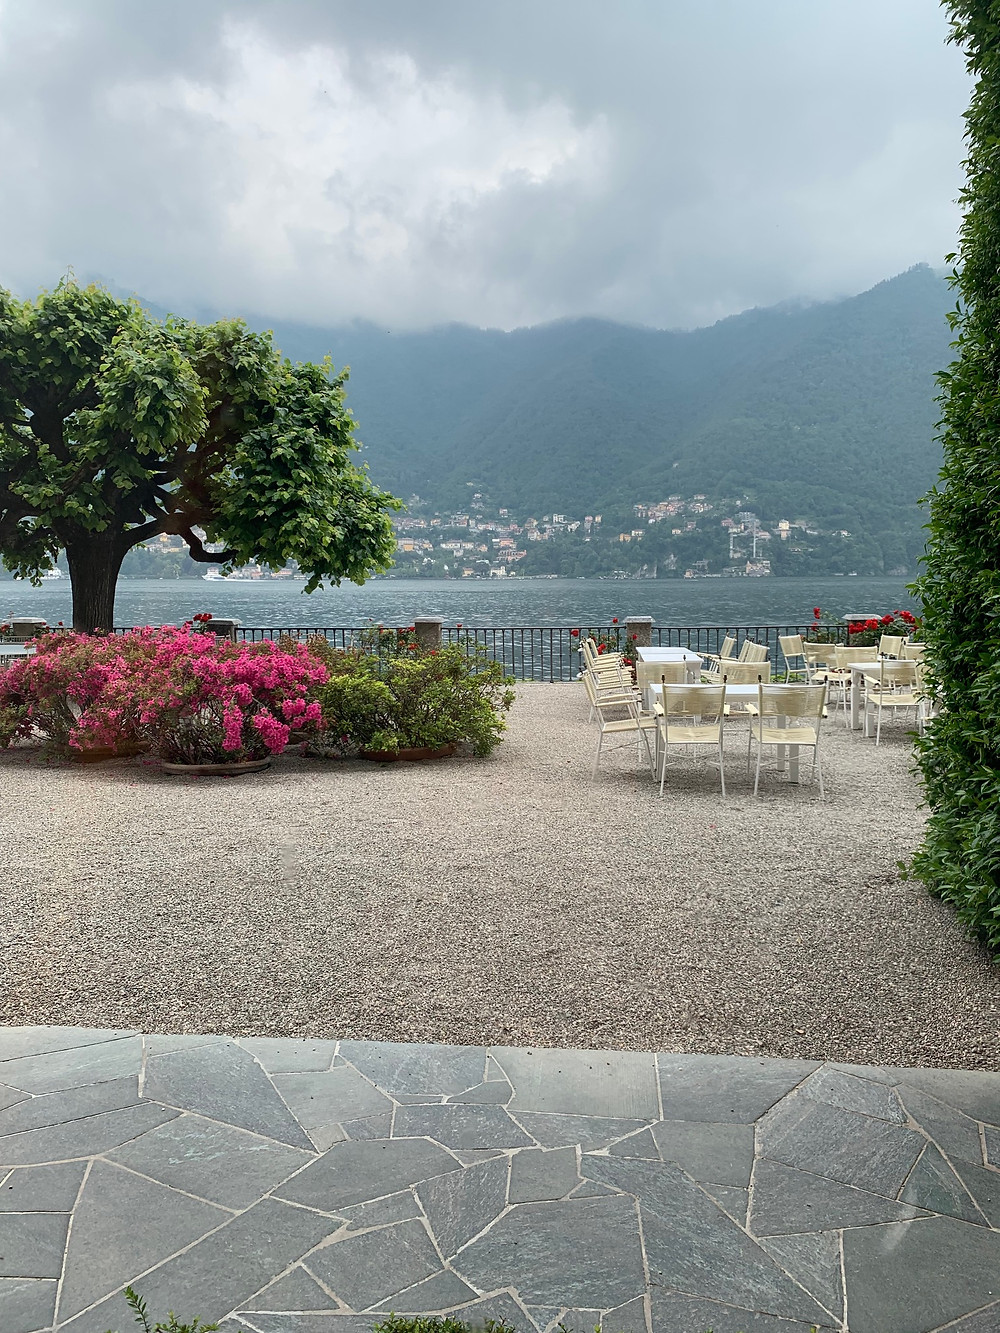 Clouds over Lake Como